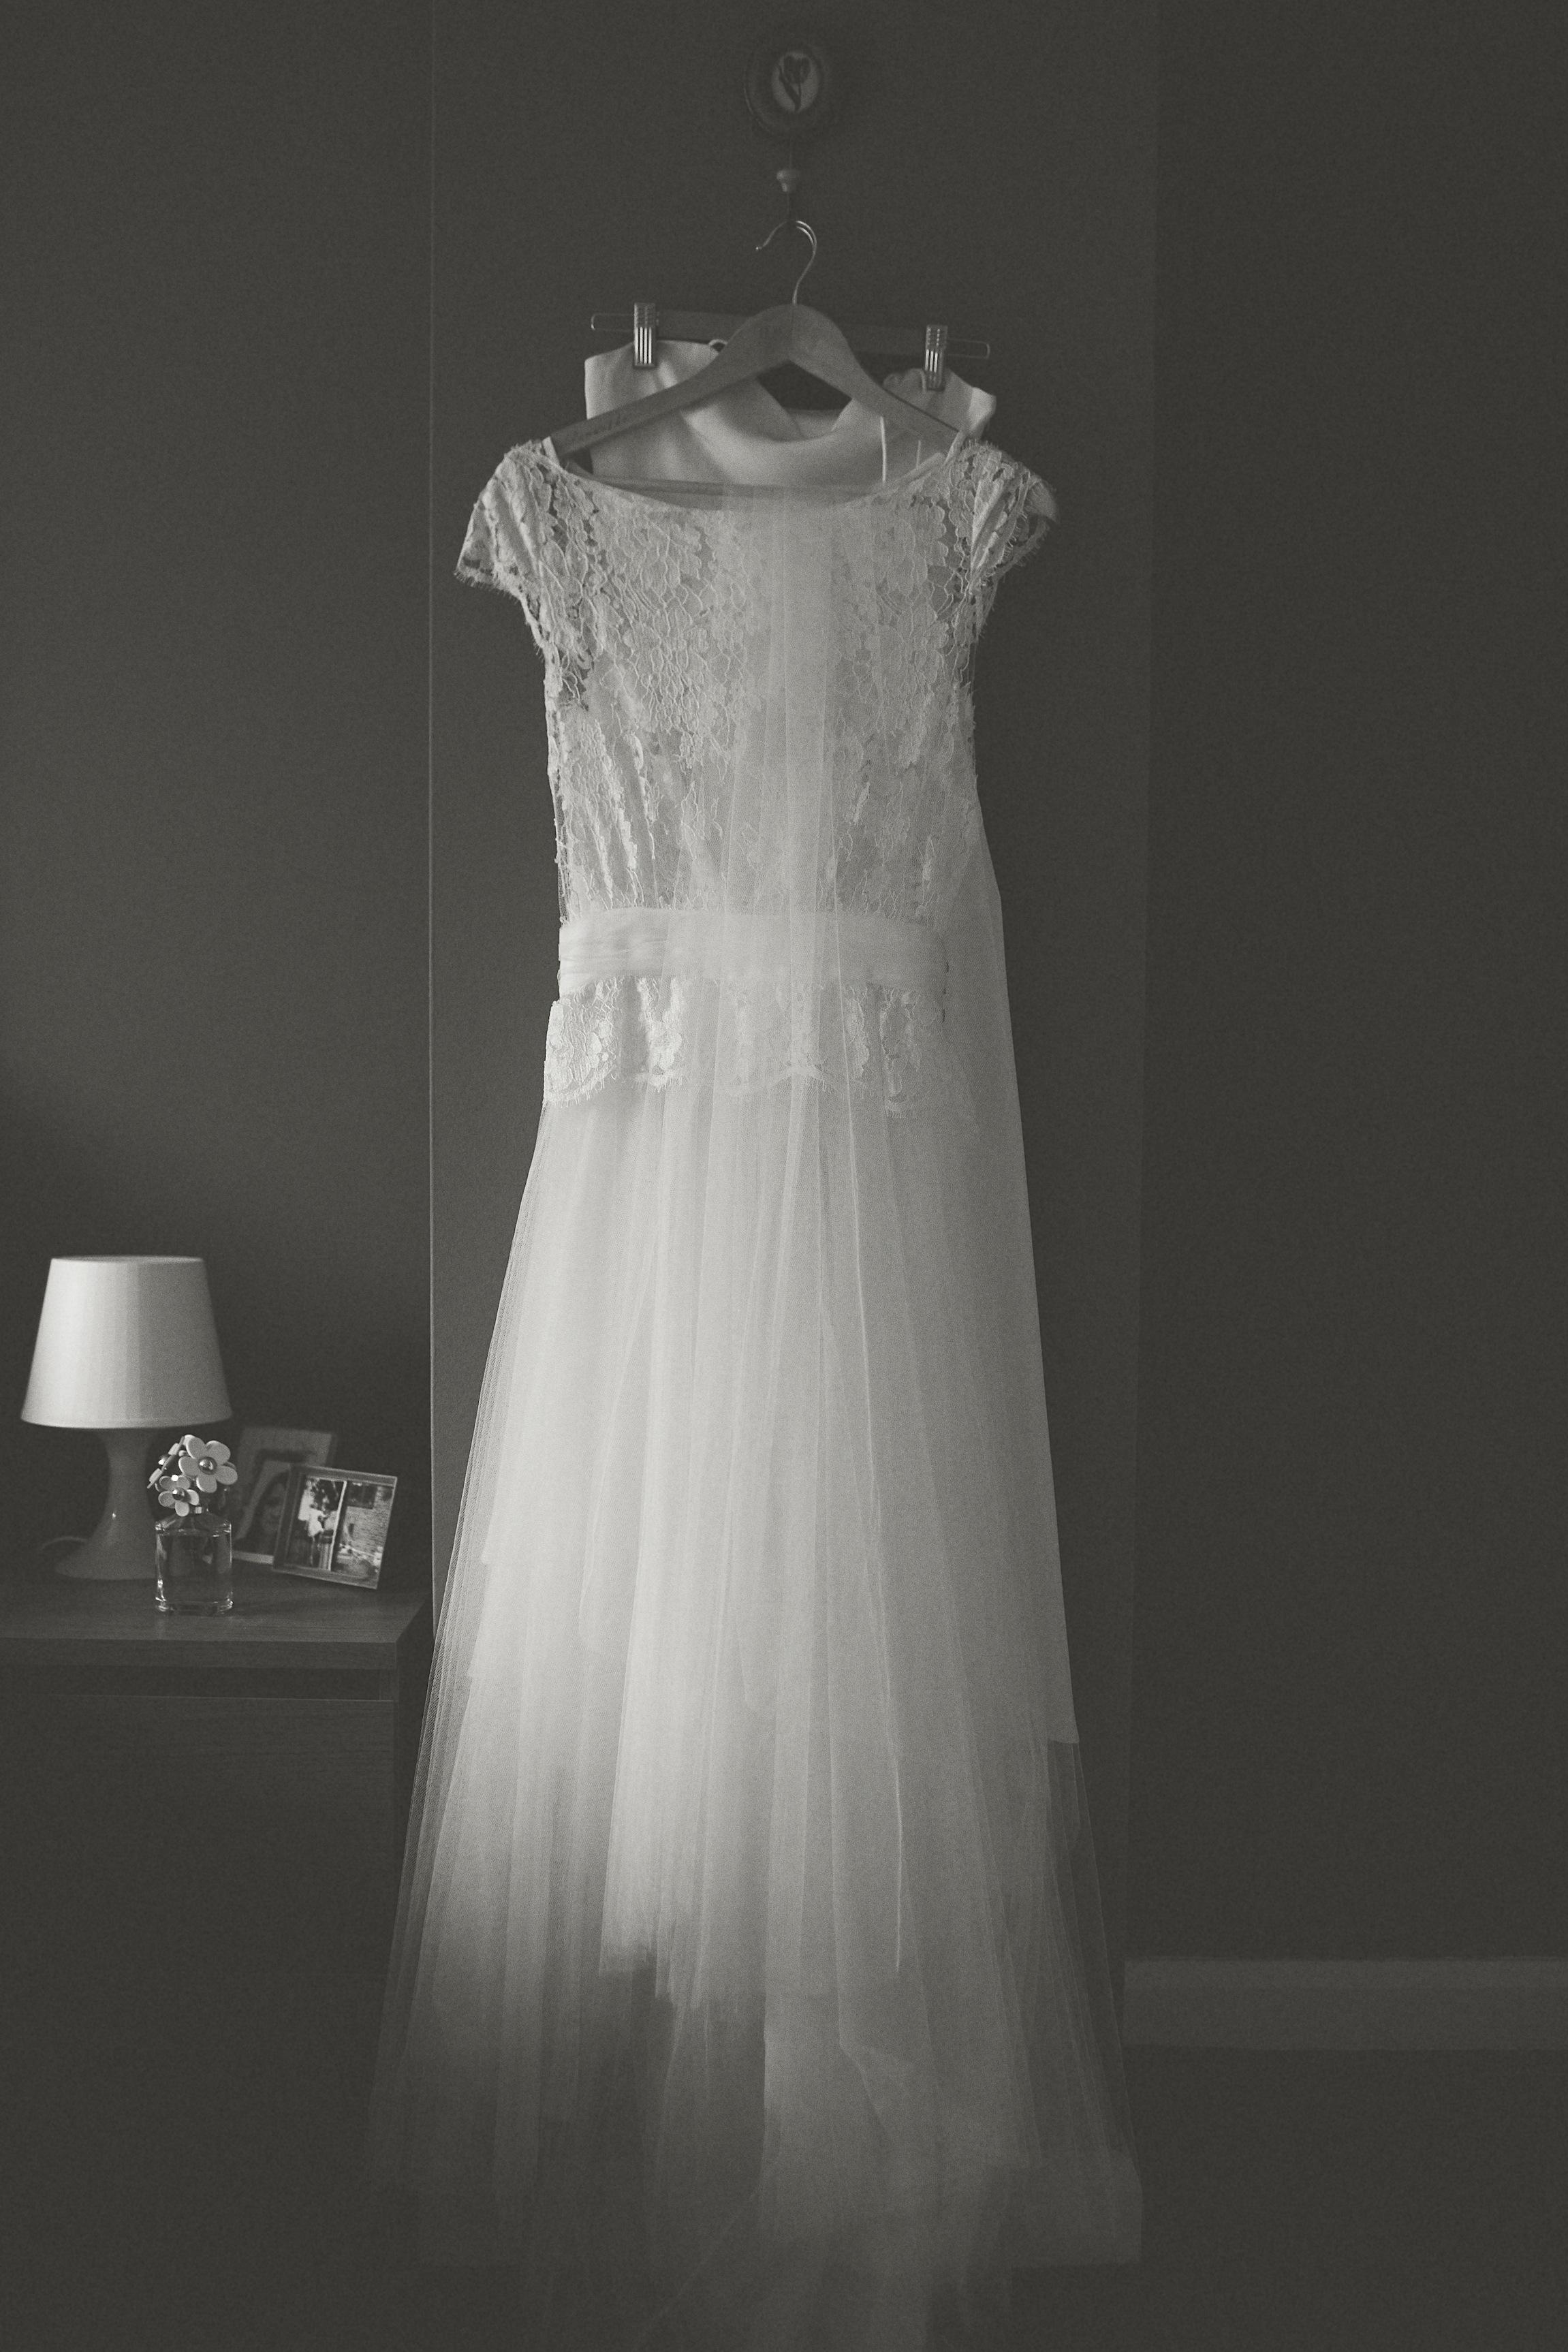 Samantha-Yorkshire-Sheffield-Bespoke-Vintage-Lace-Tulle-Bride-Wedding-Dress-Susanna-Greening-Derbyshire-1